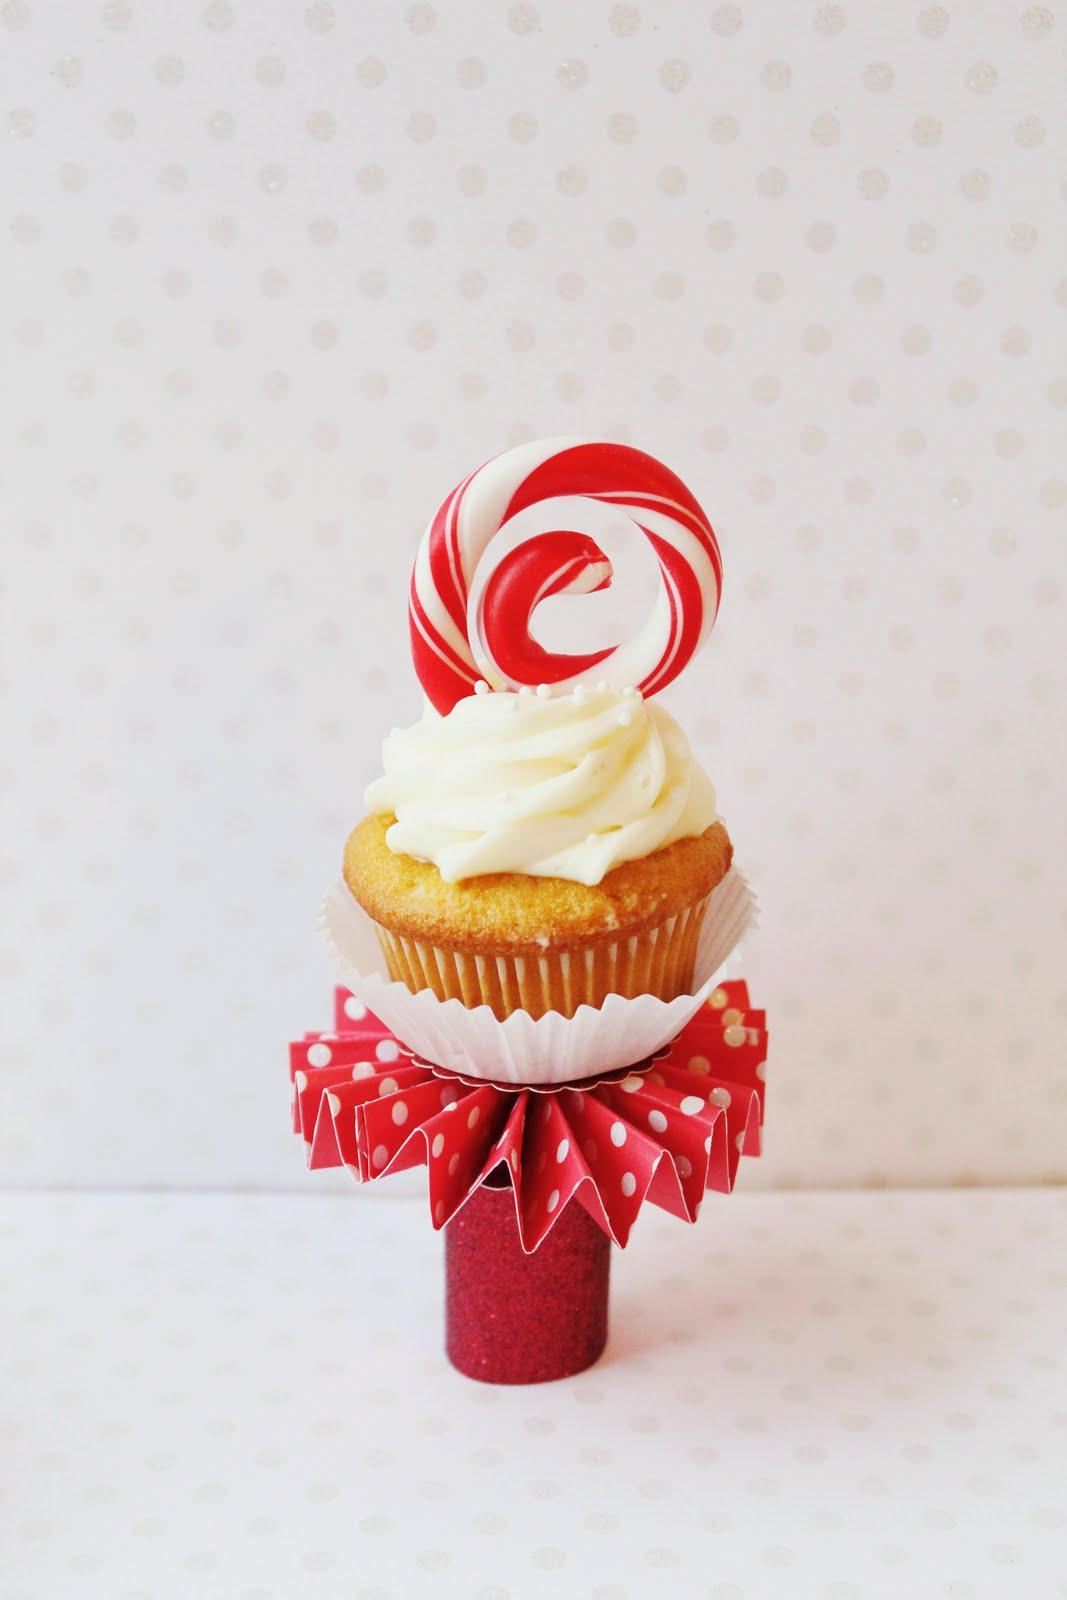 Icing Designs Diy Mini Rosette Cupcake Stands